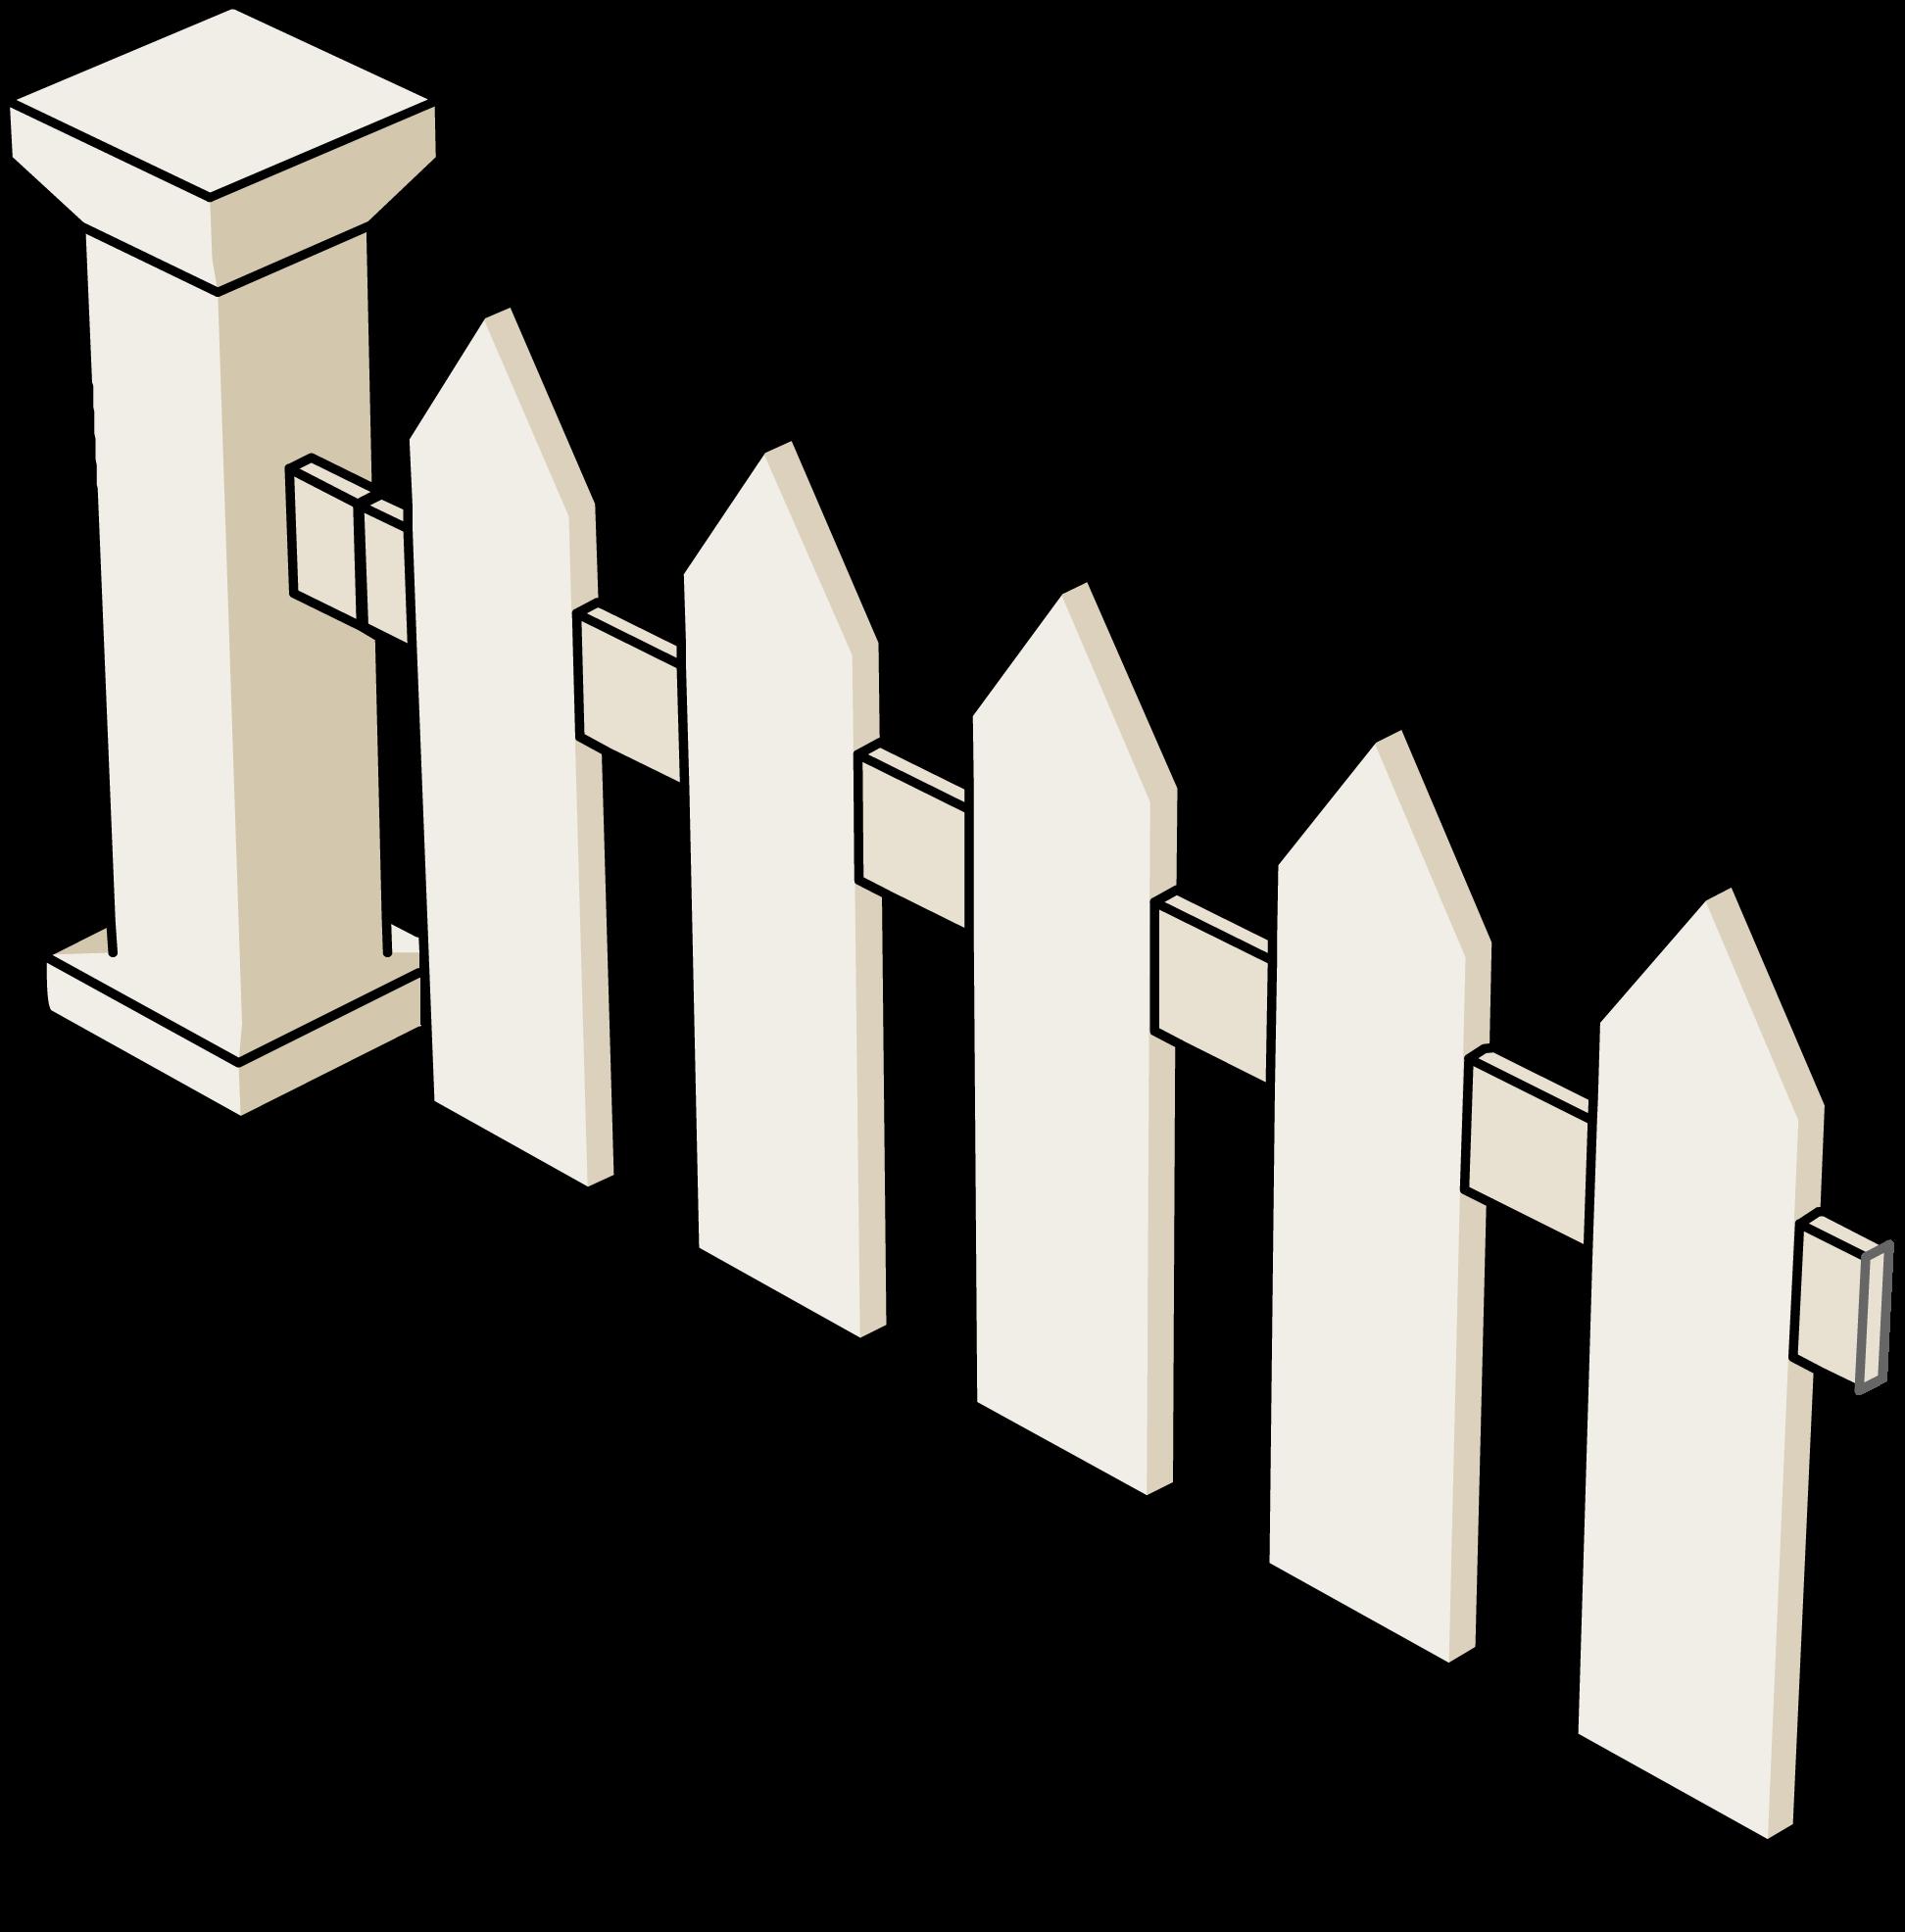 image picket fence sprite 007 club penguin wiki fandom